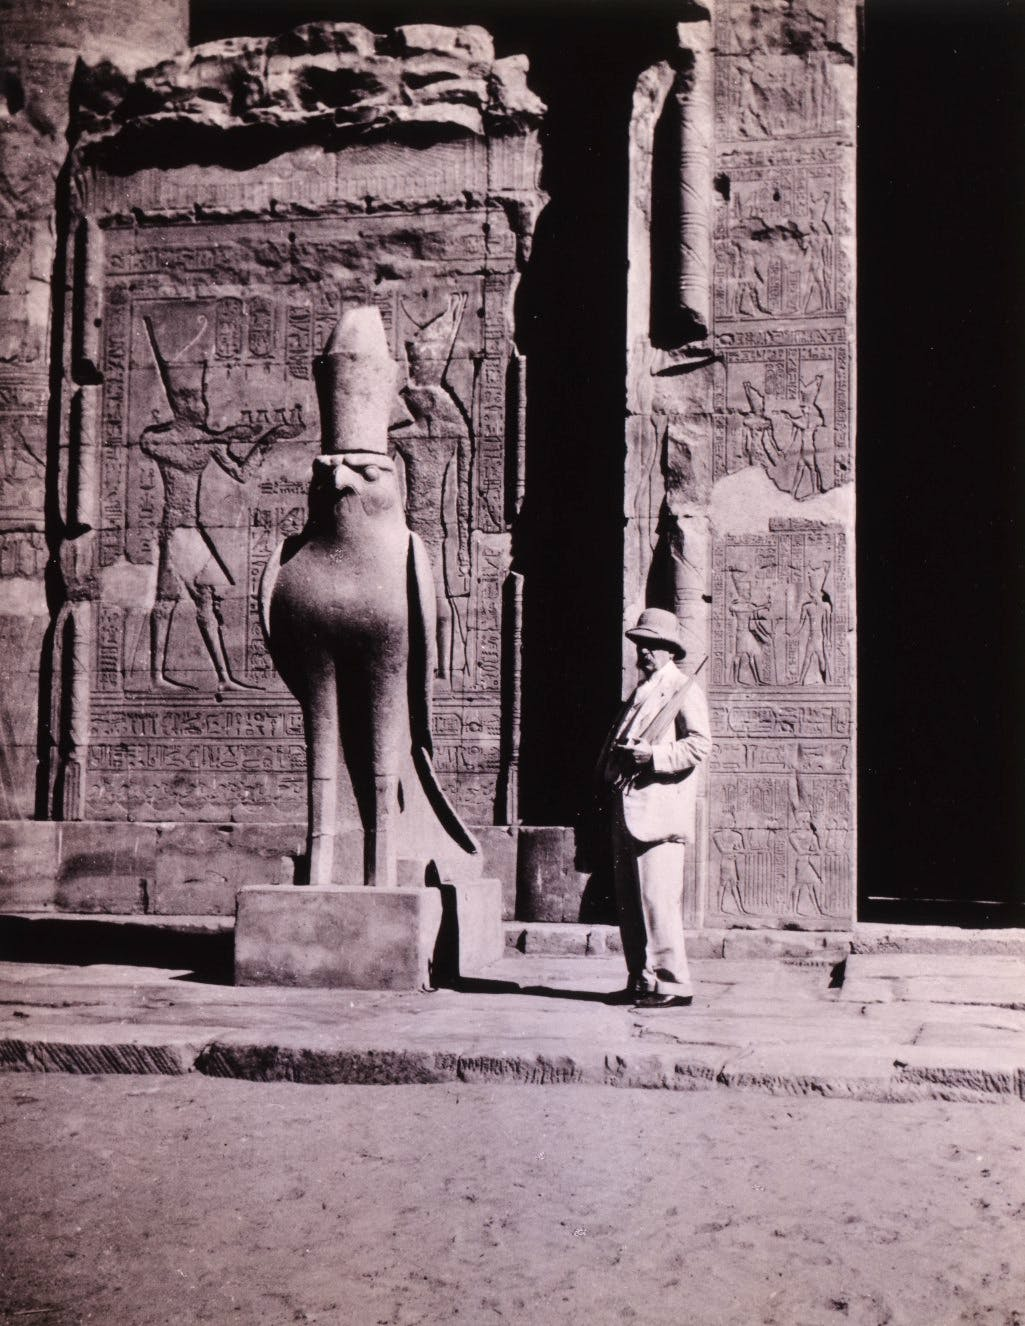 John Pierpont Morgan at the Temple of Horus at Edfu, Egypt, 1913 or earlier